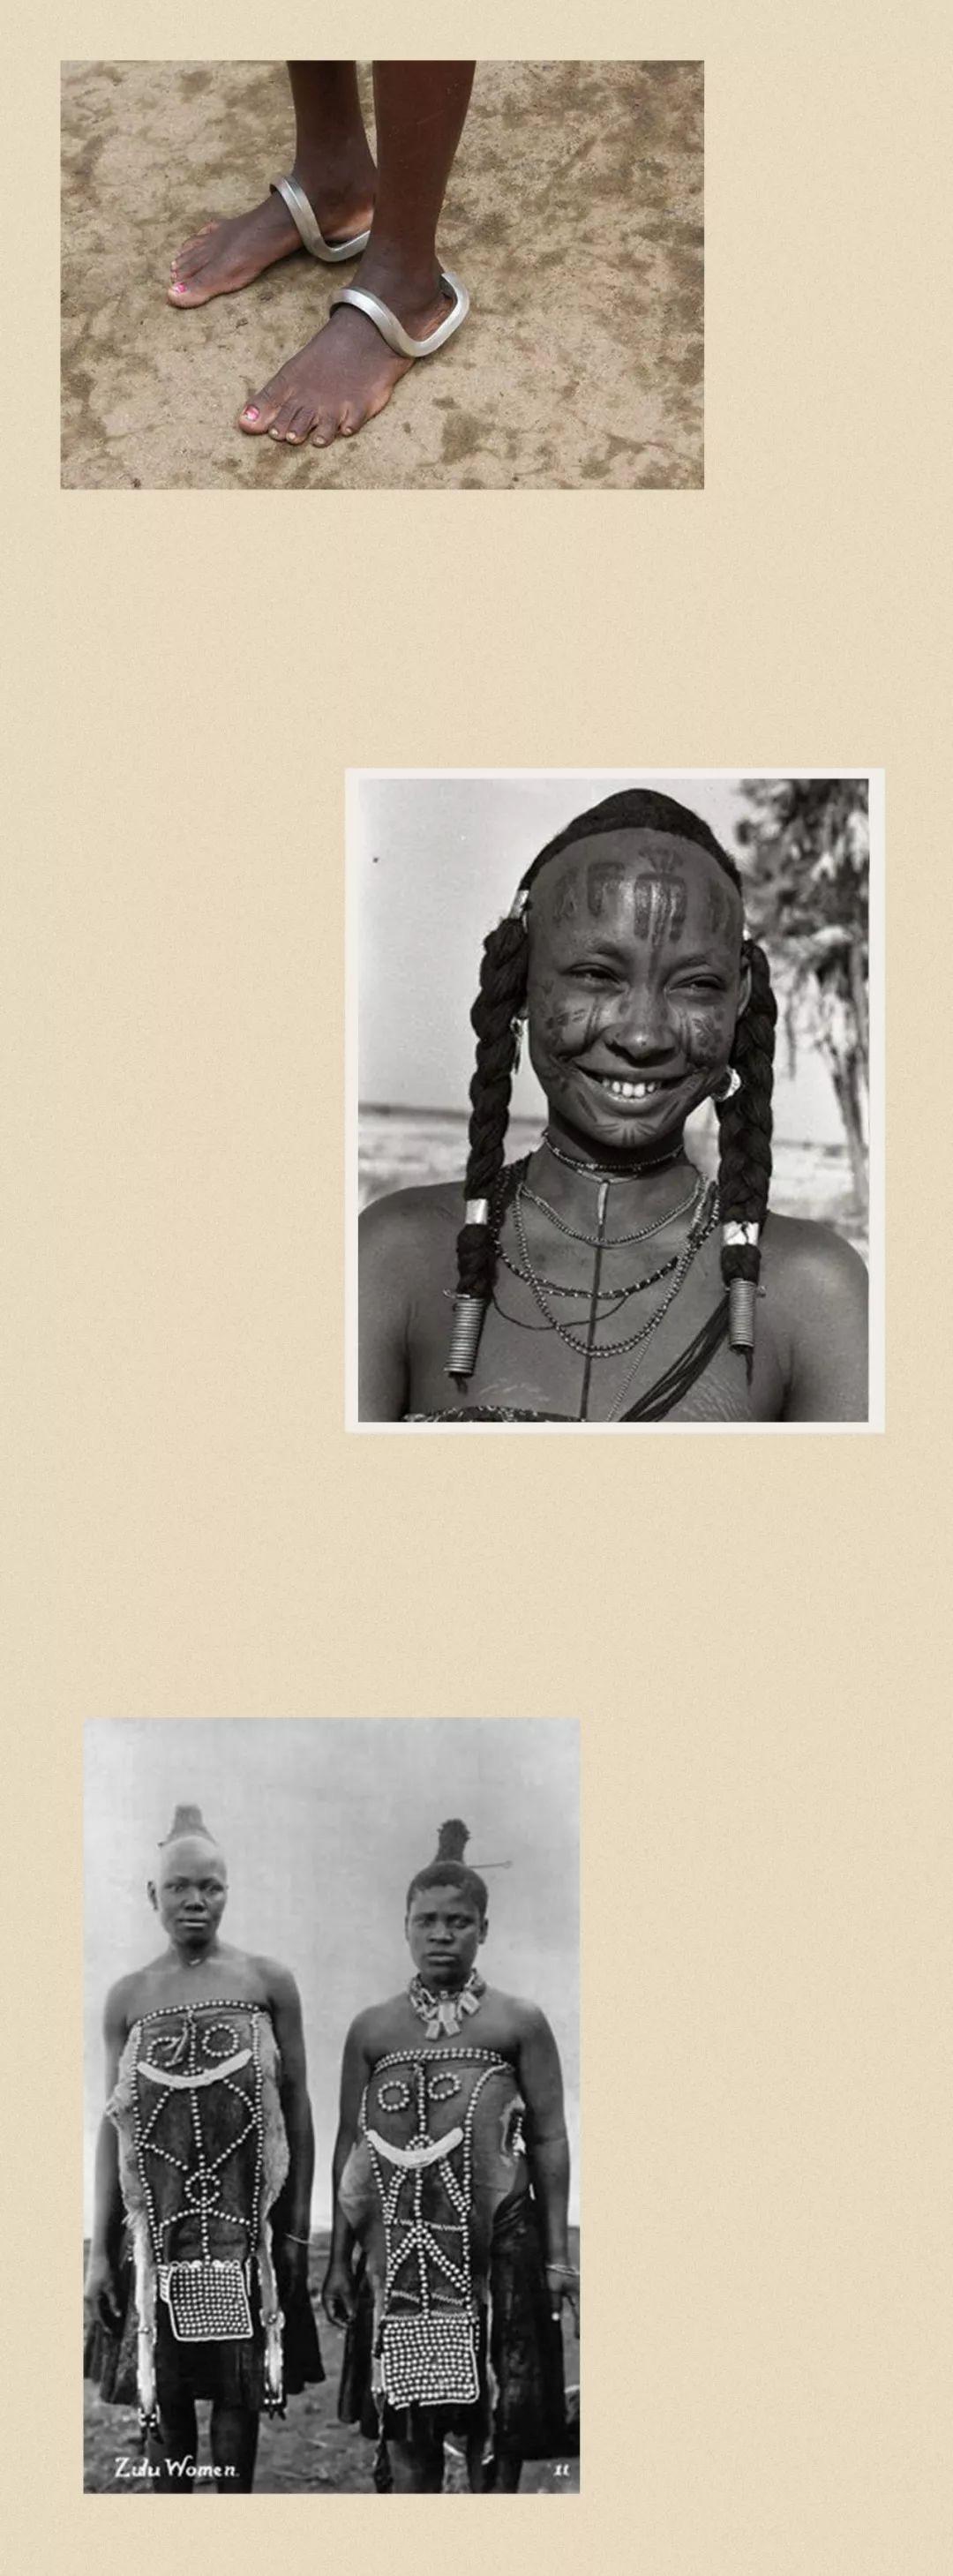 Tribal fantasy in Orissa by RURO photography  Chad woman  Zulu Women, 1904, South Africa